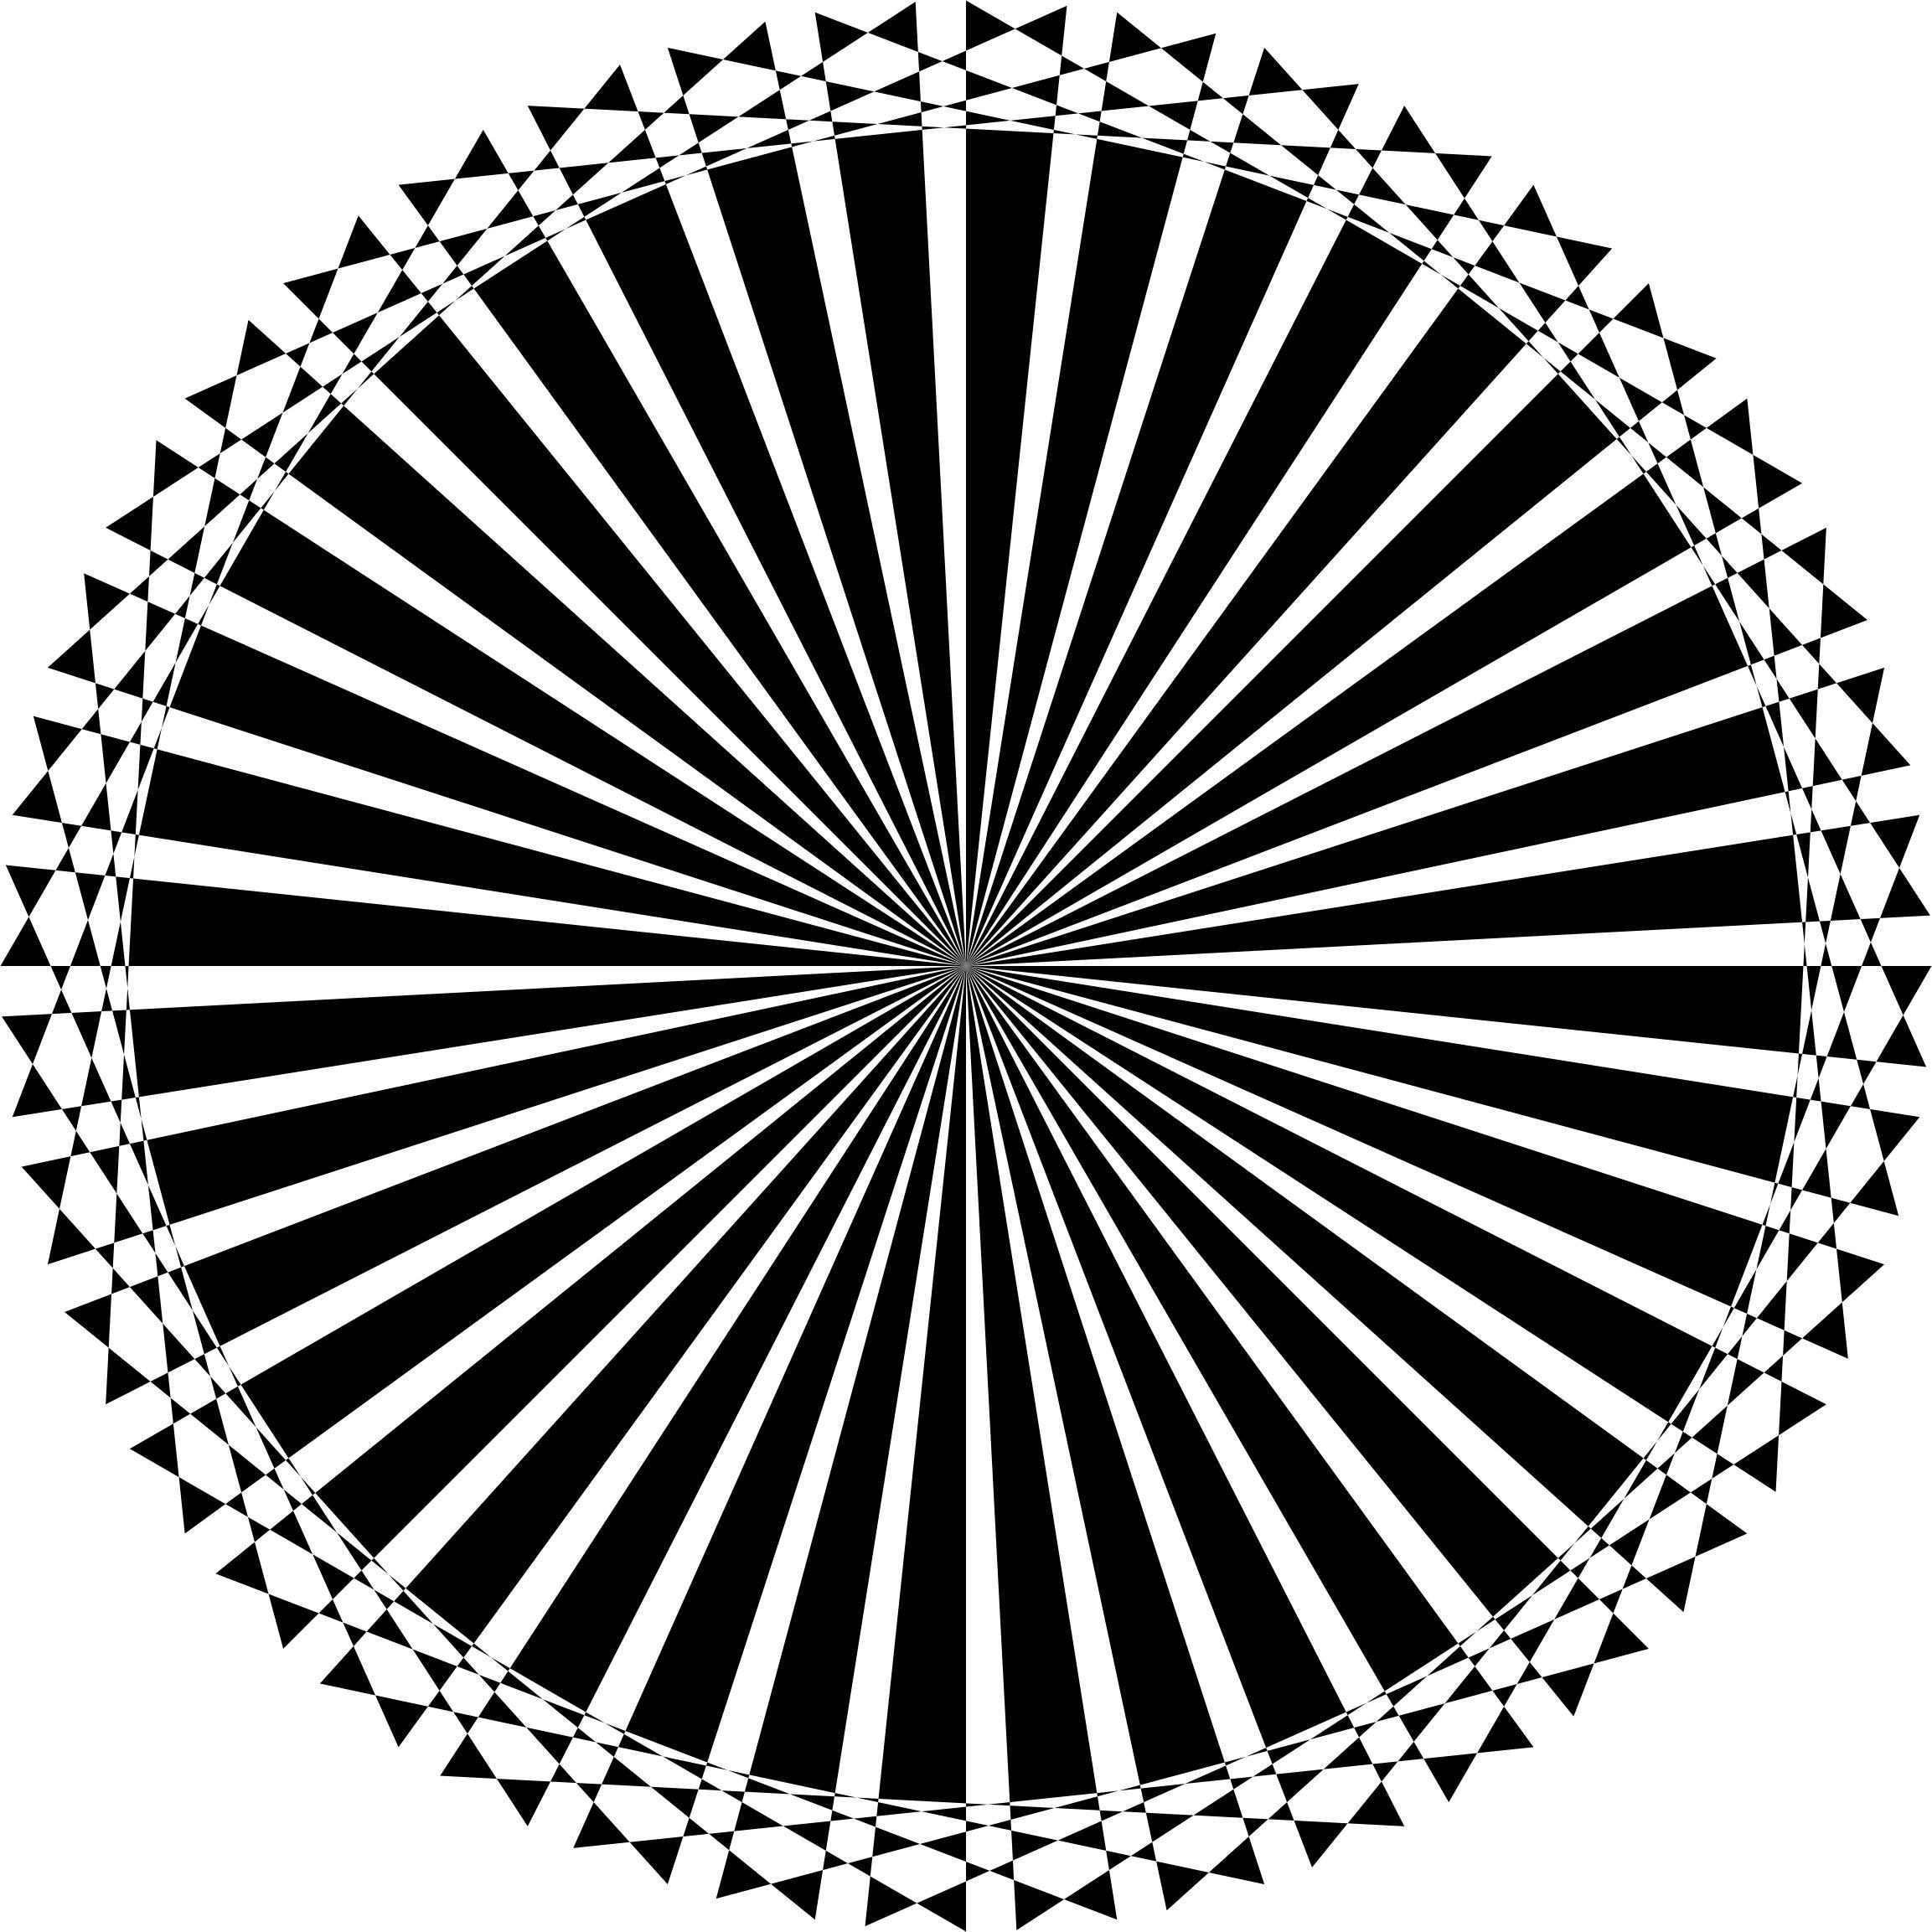 2306x2306 Checkered Sunburst Mandala Icons Png